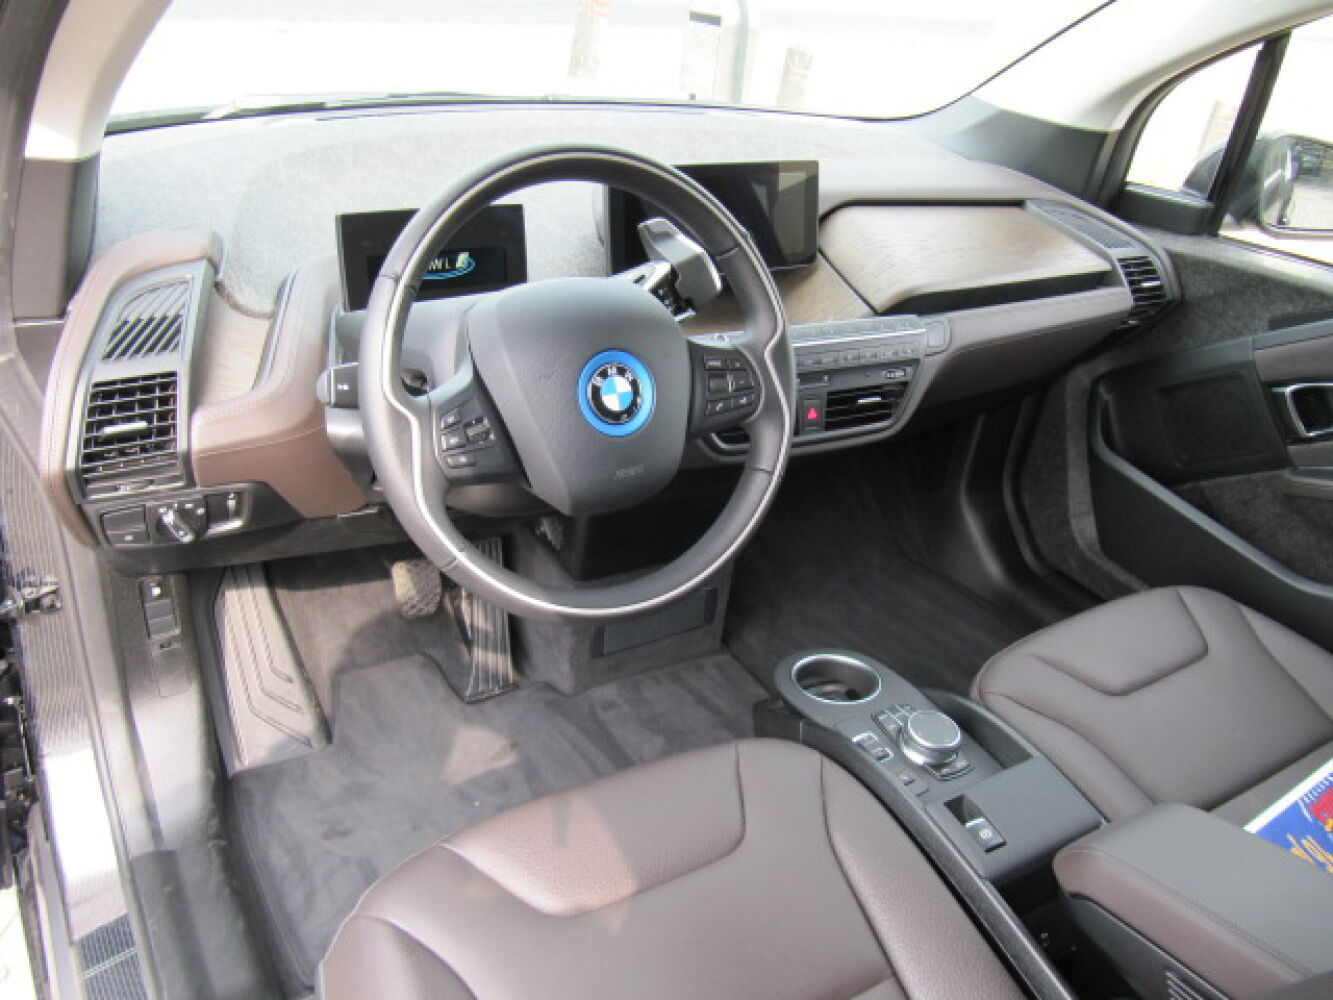 BMW i3 94 REX 6/18